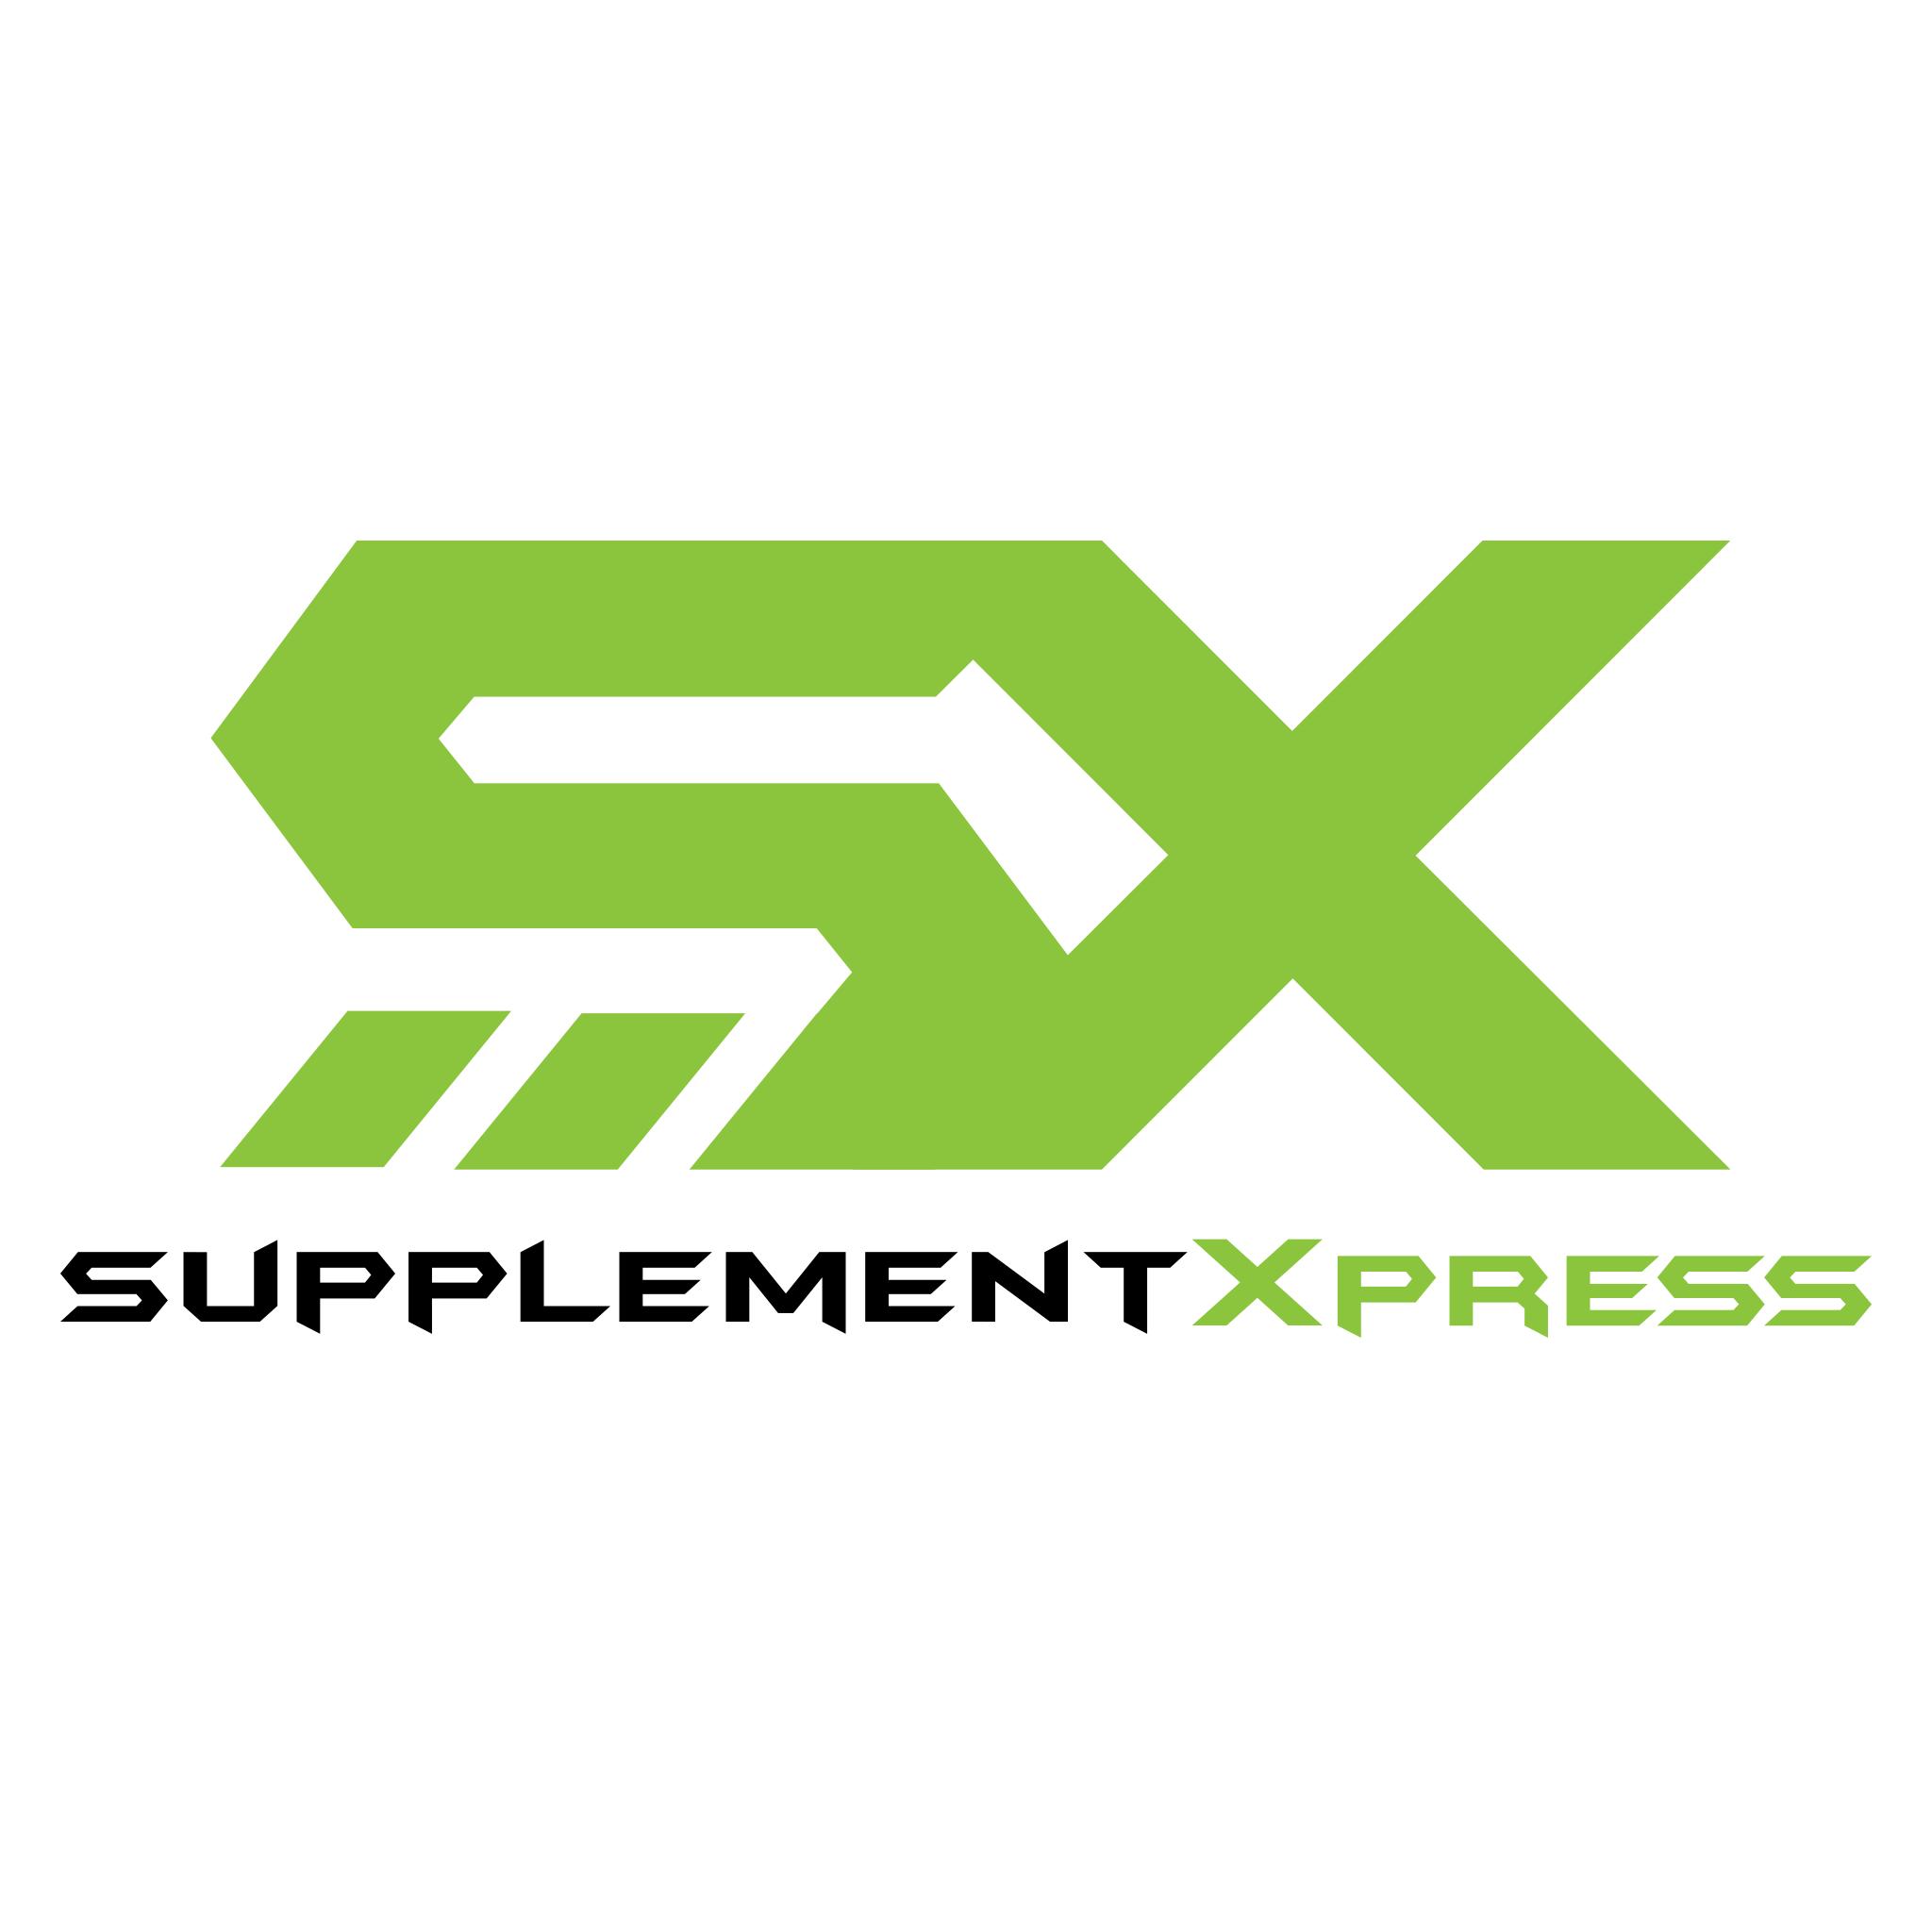 Supplement Xpress Franchise